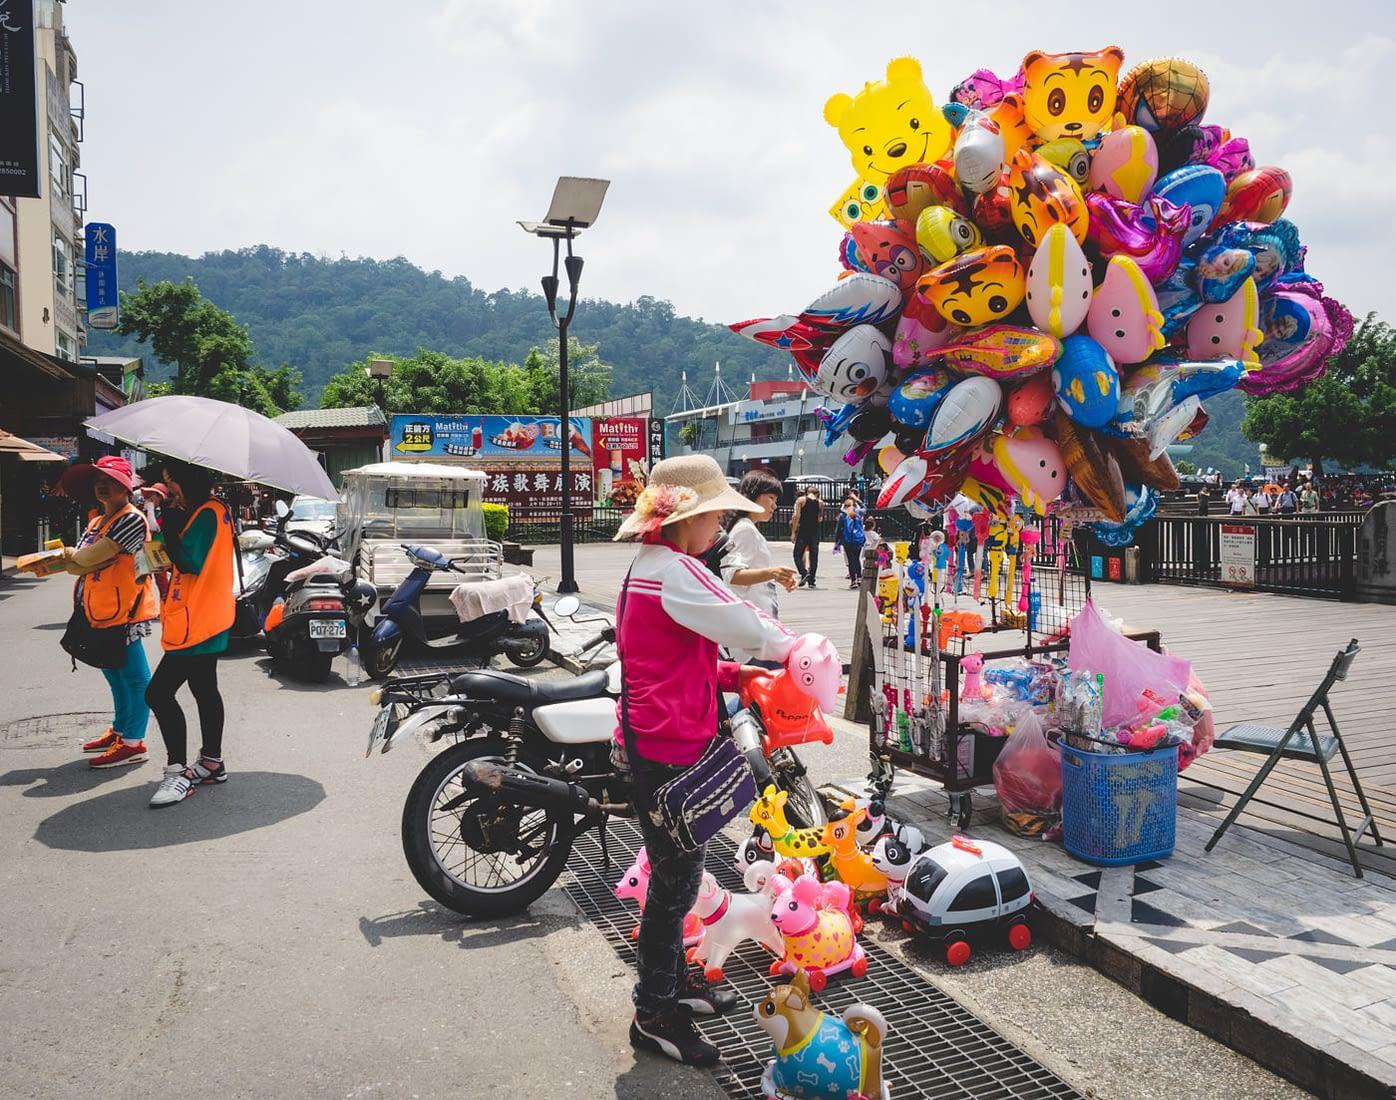 Taiwan - Nantou City - Random popup stall selling balloon